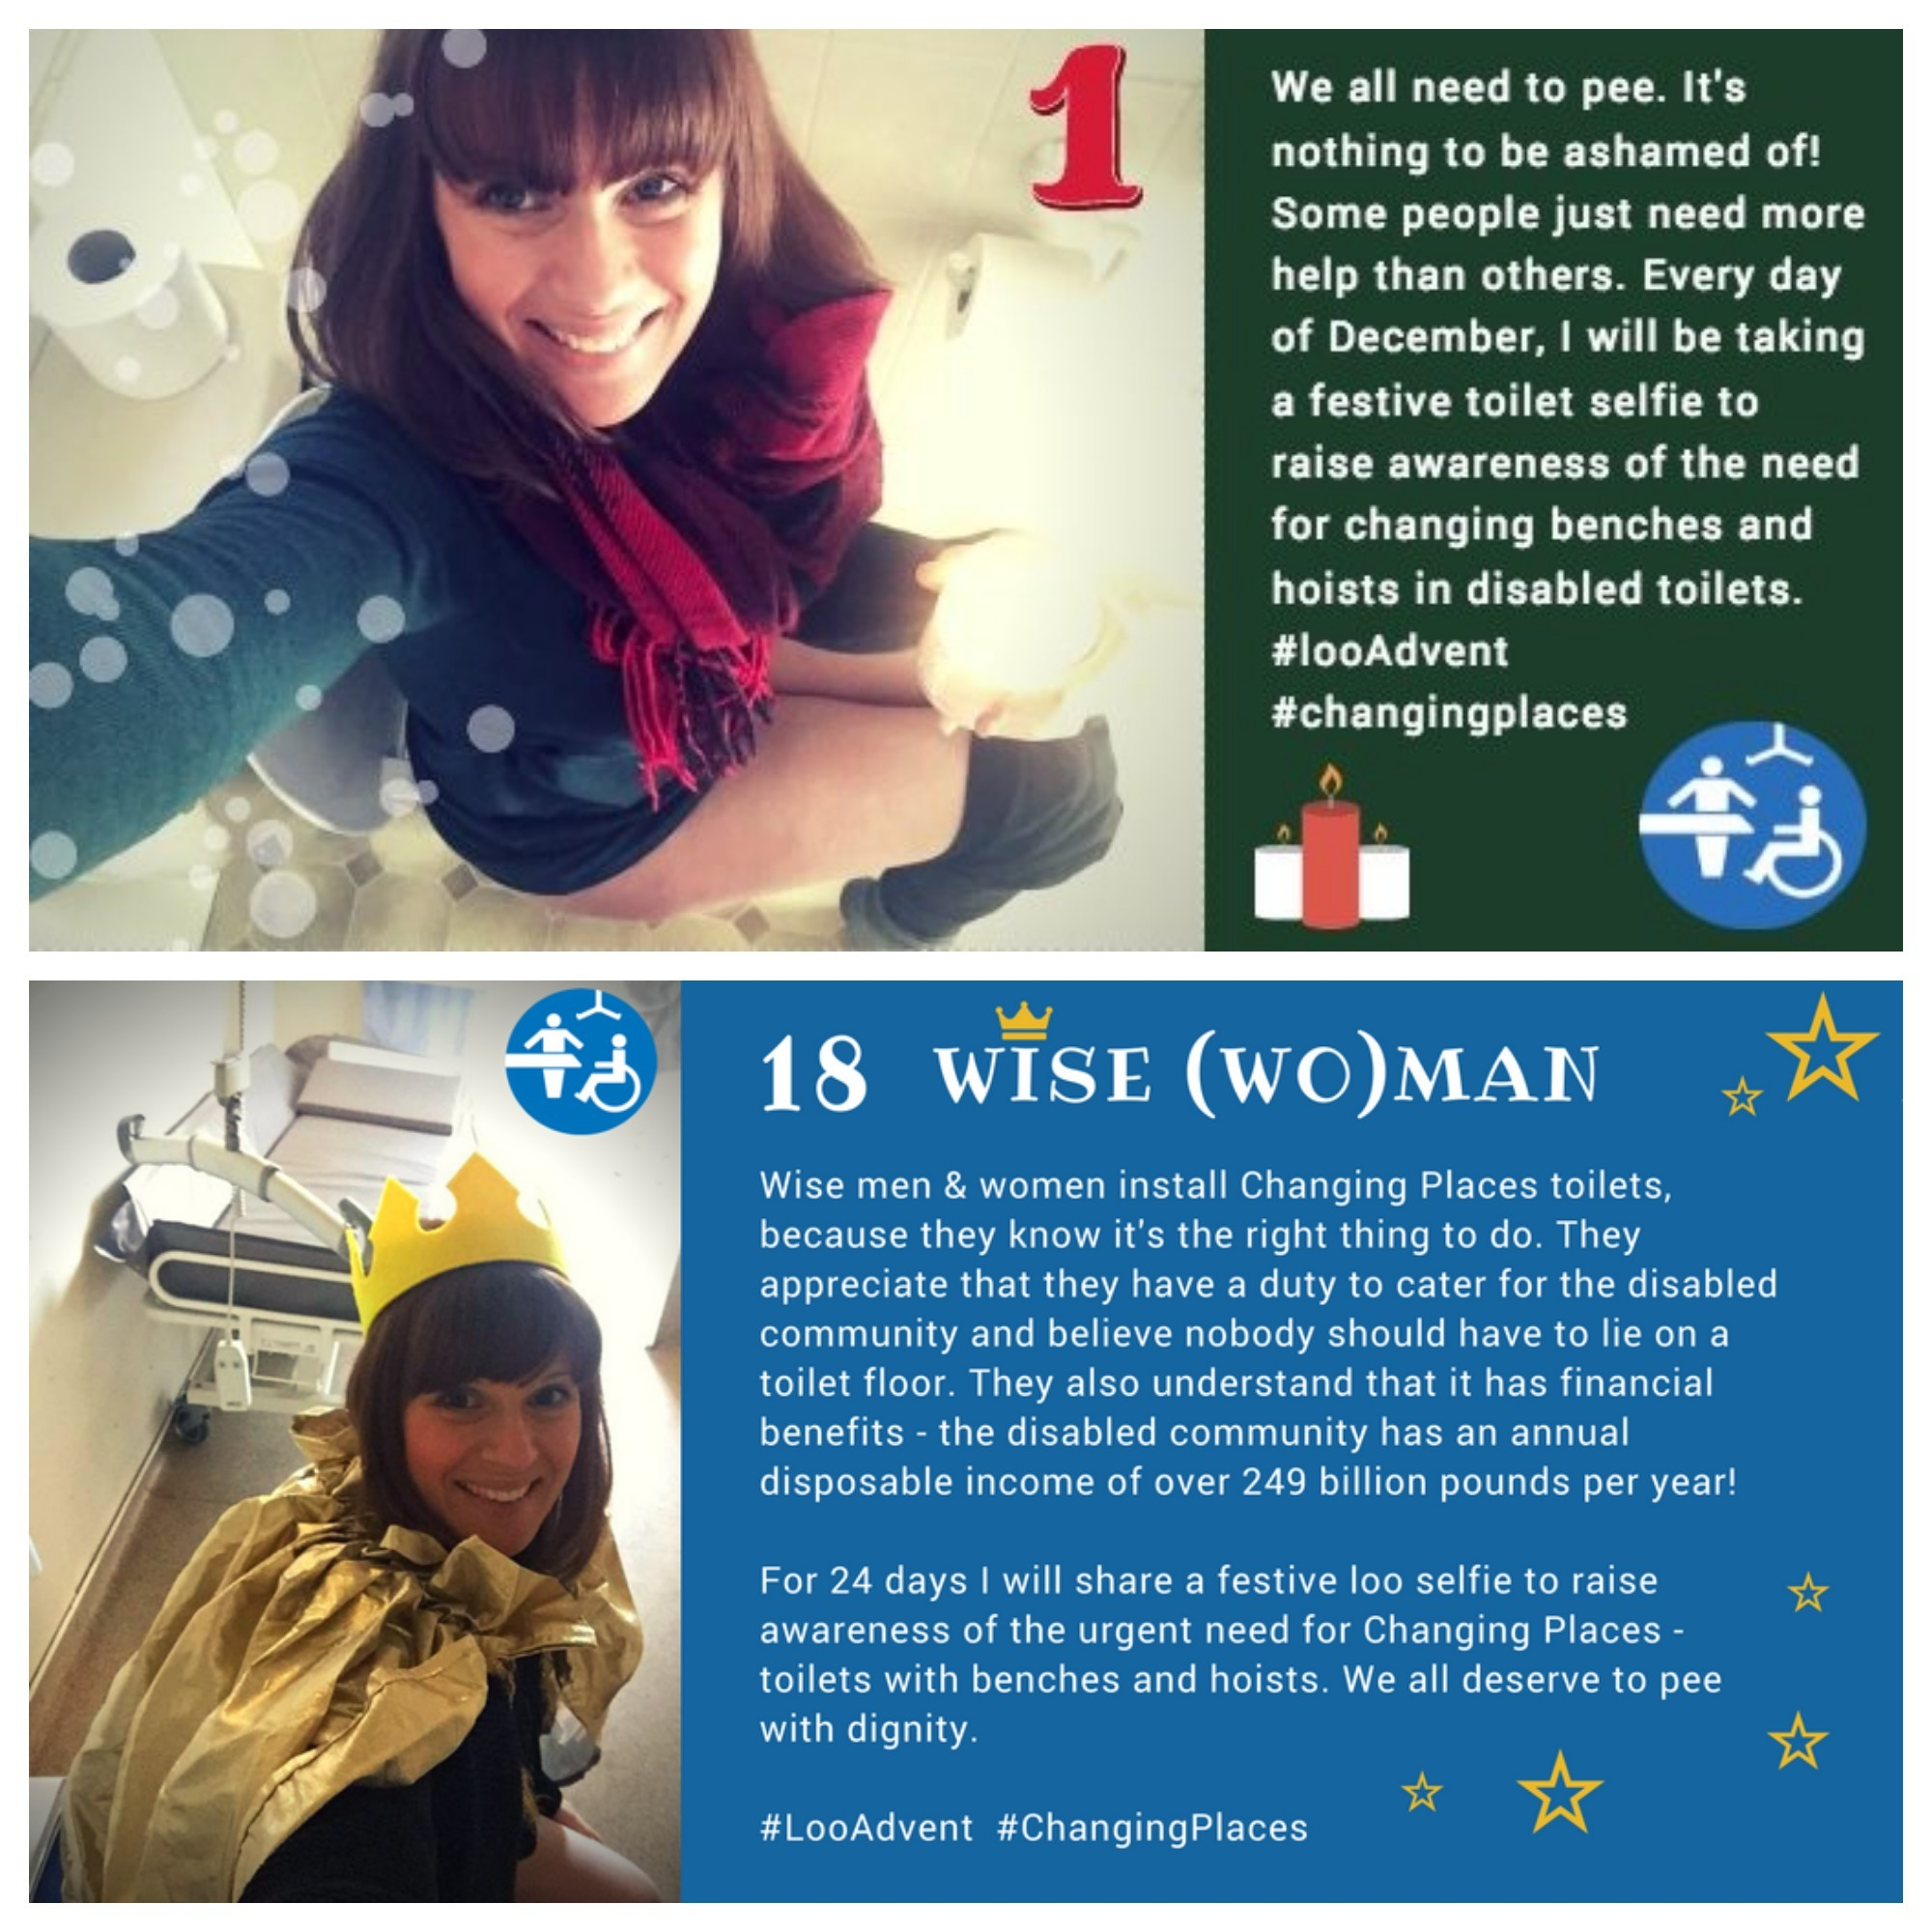 #LooAdvent awareness campaign